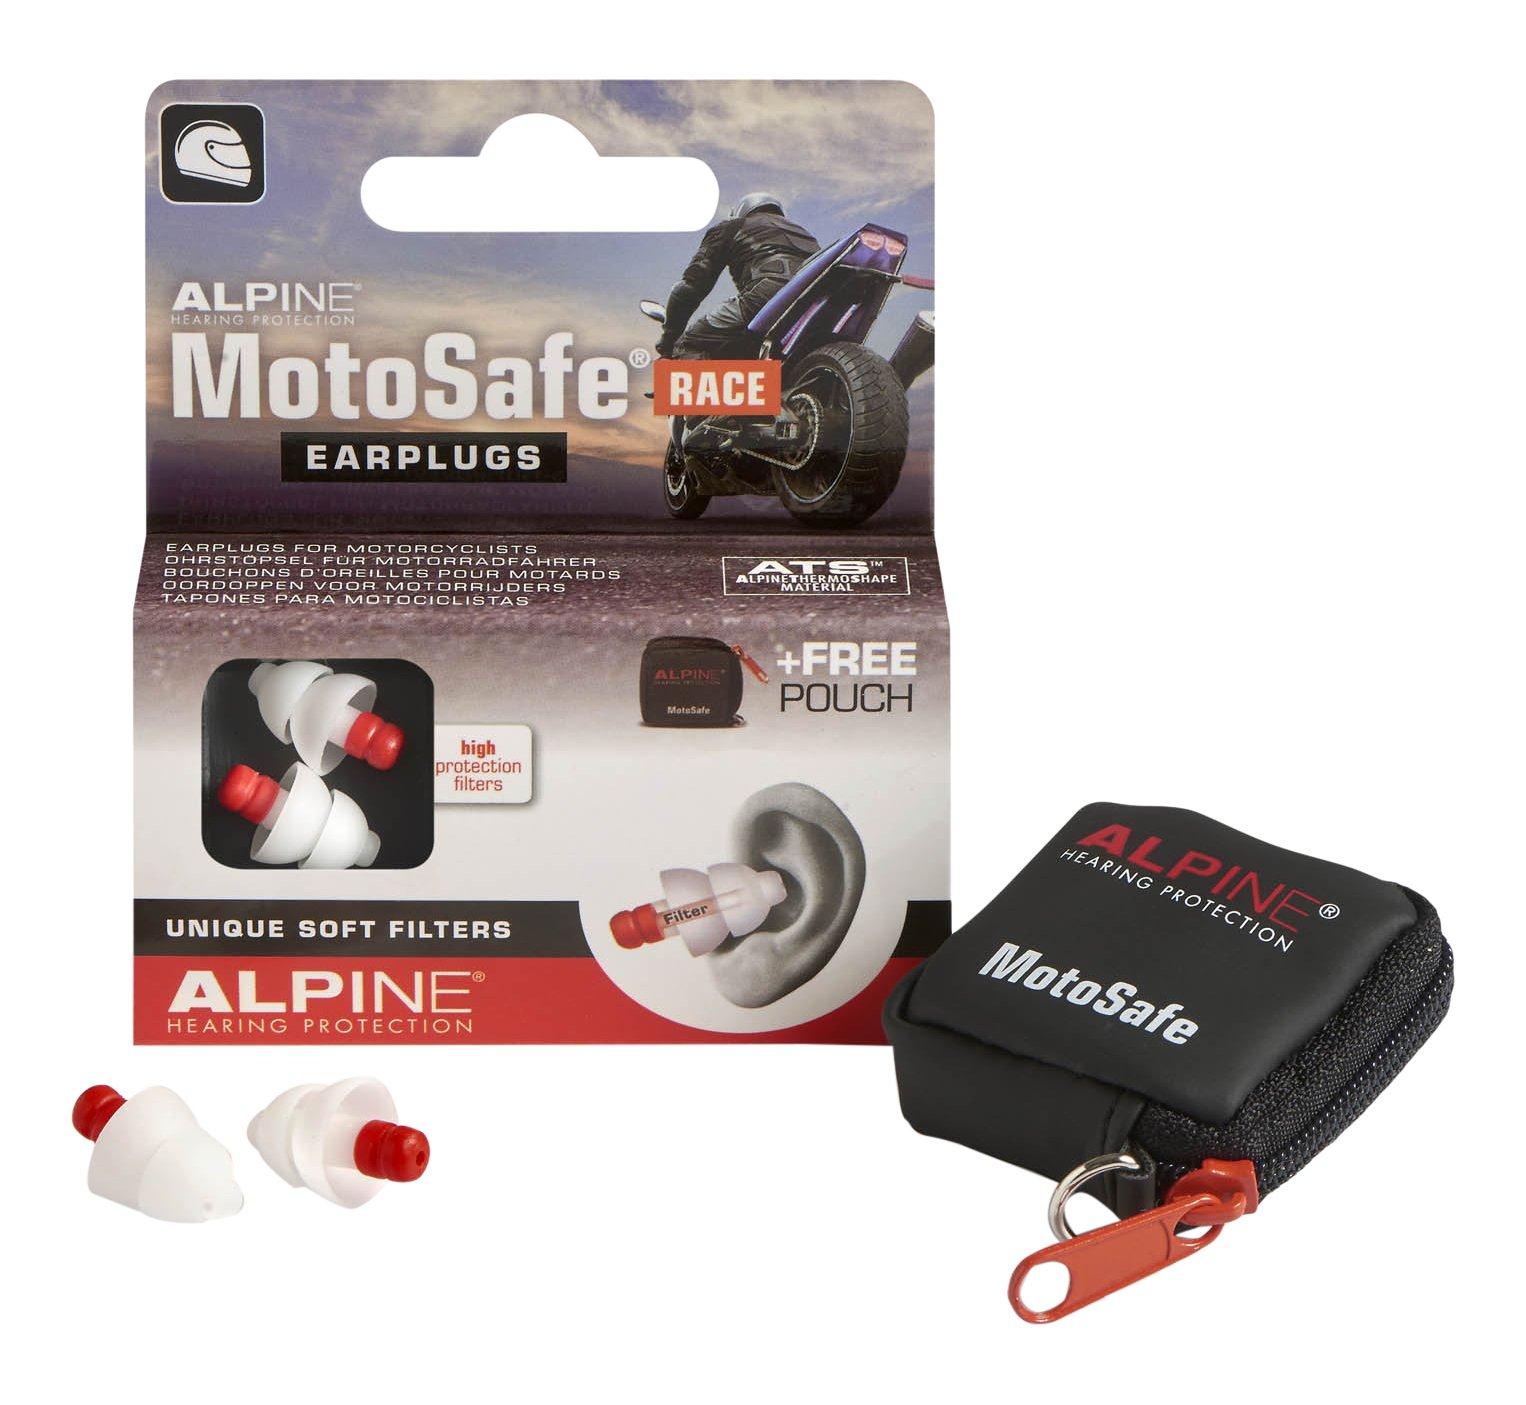 Alpine Hearing Protection Earplugs Motosafe, Race